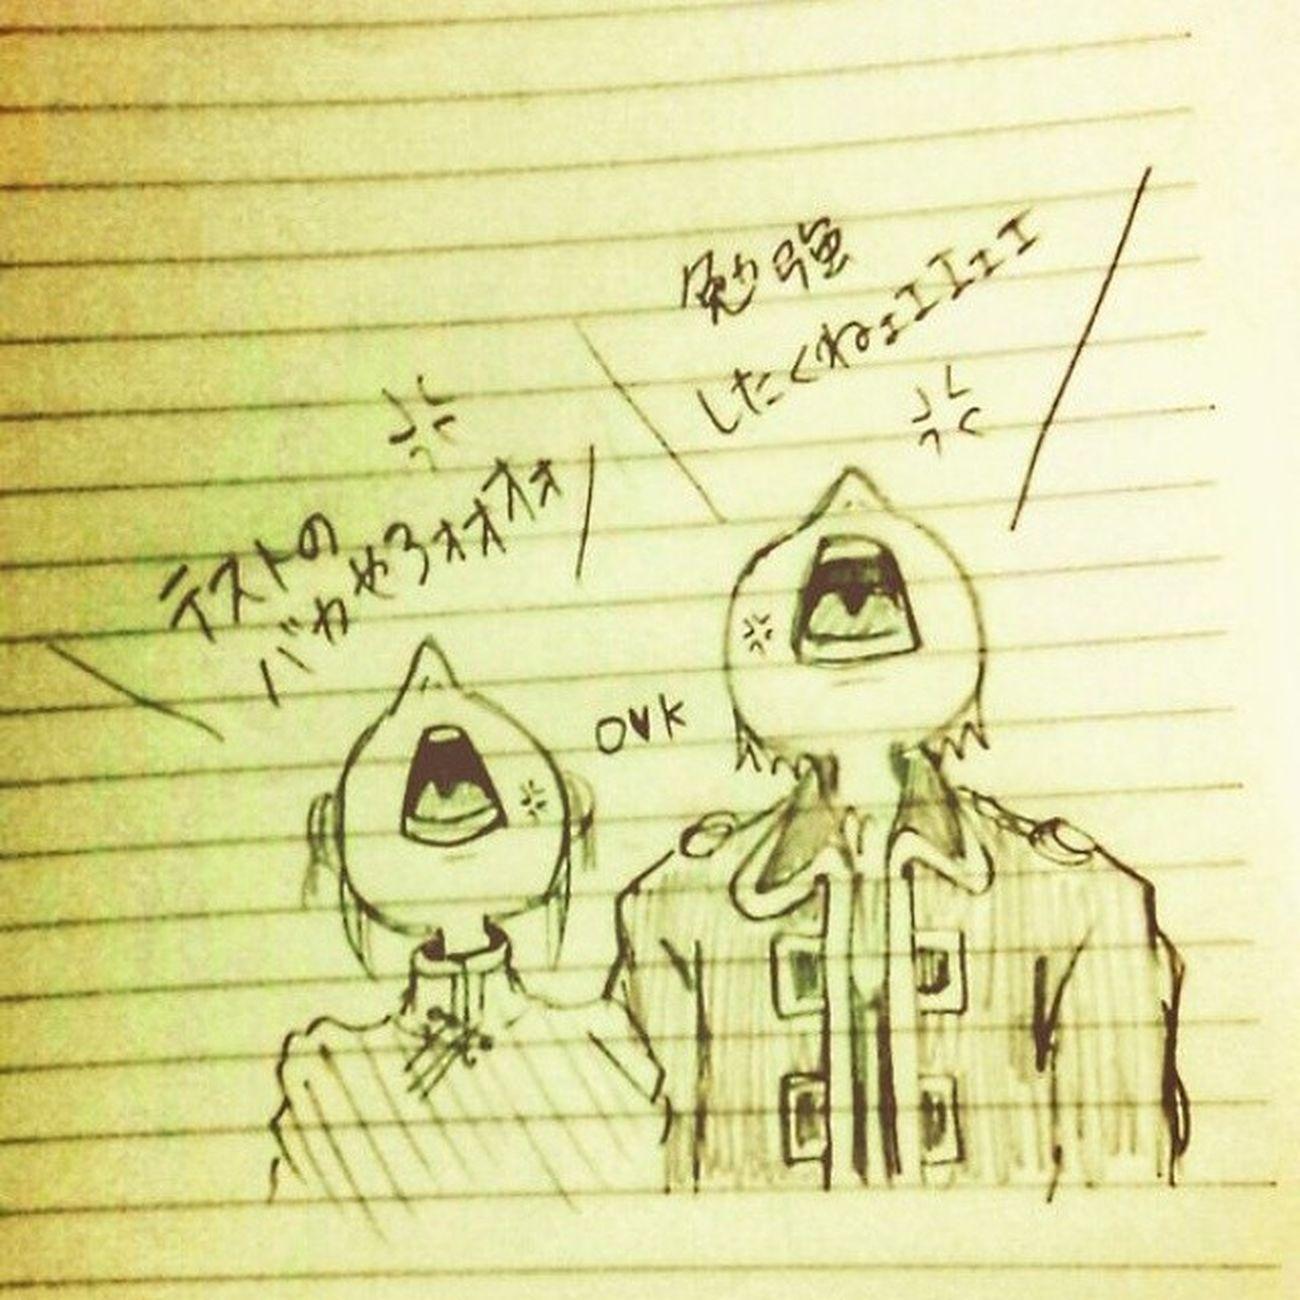 Anime Comic Gintama Kagura Okita 漫画 銀魂 沖田総悟 神楽 絵